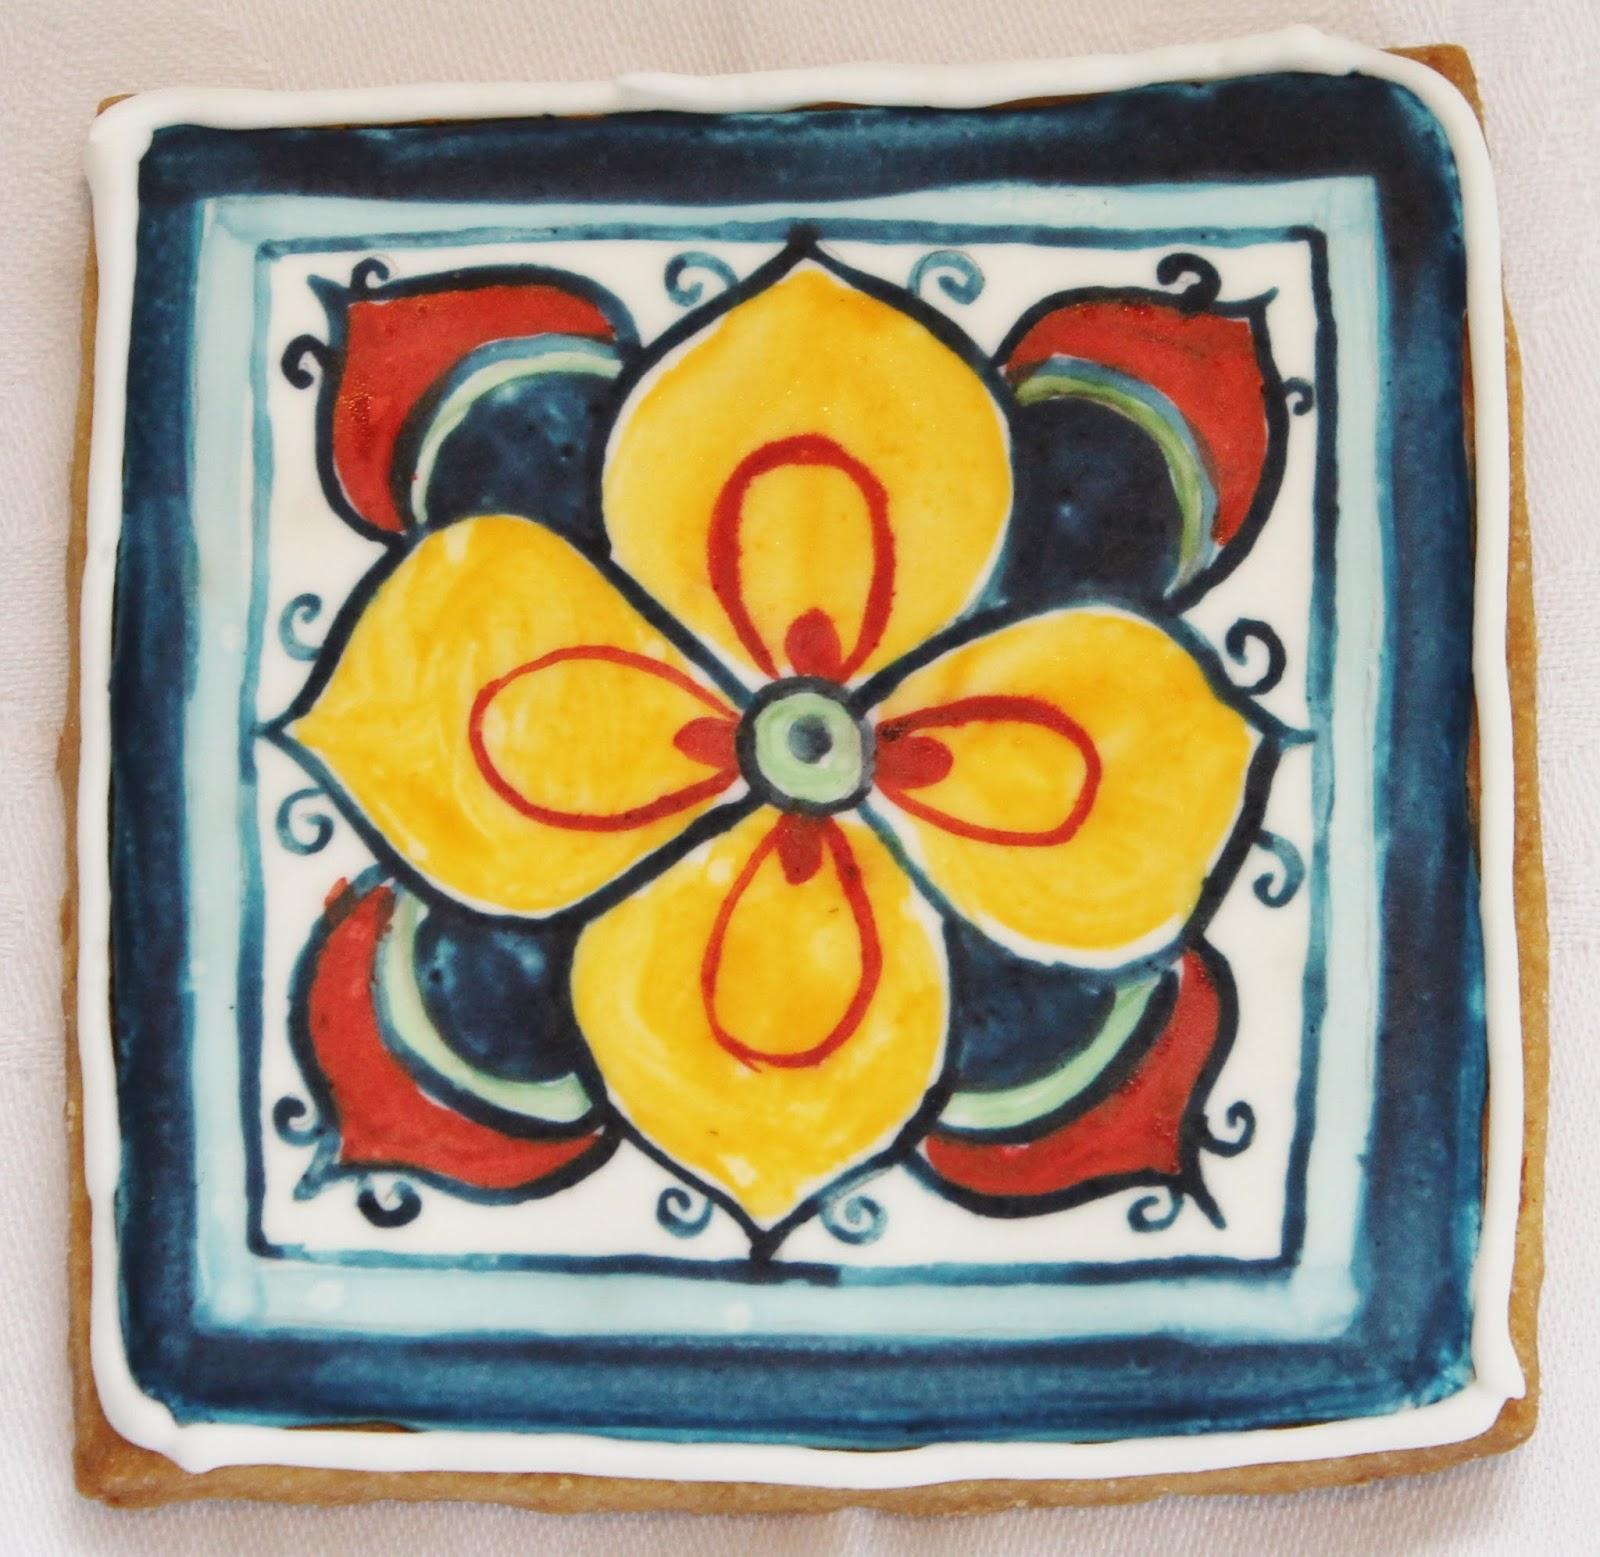 julias torten und t rtchen fliesen kekse tile cookies. Black Bedroom Furniture Sets. Home Design Ideas